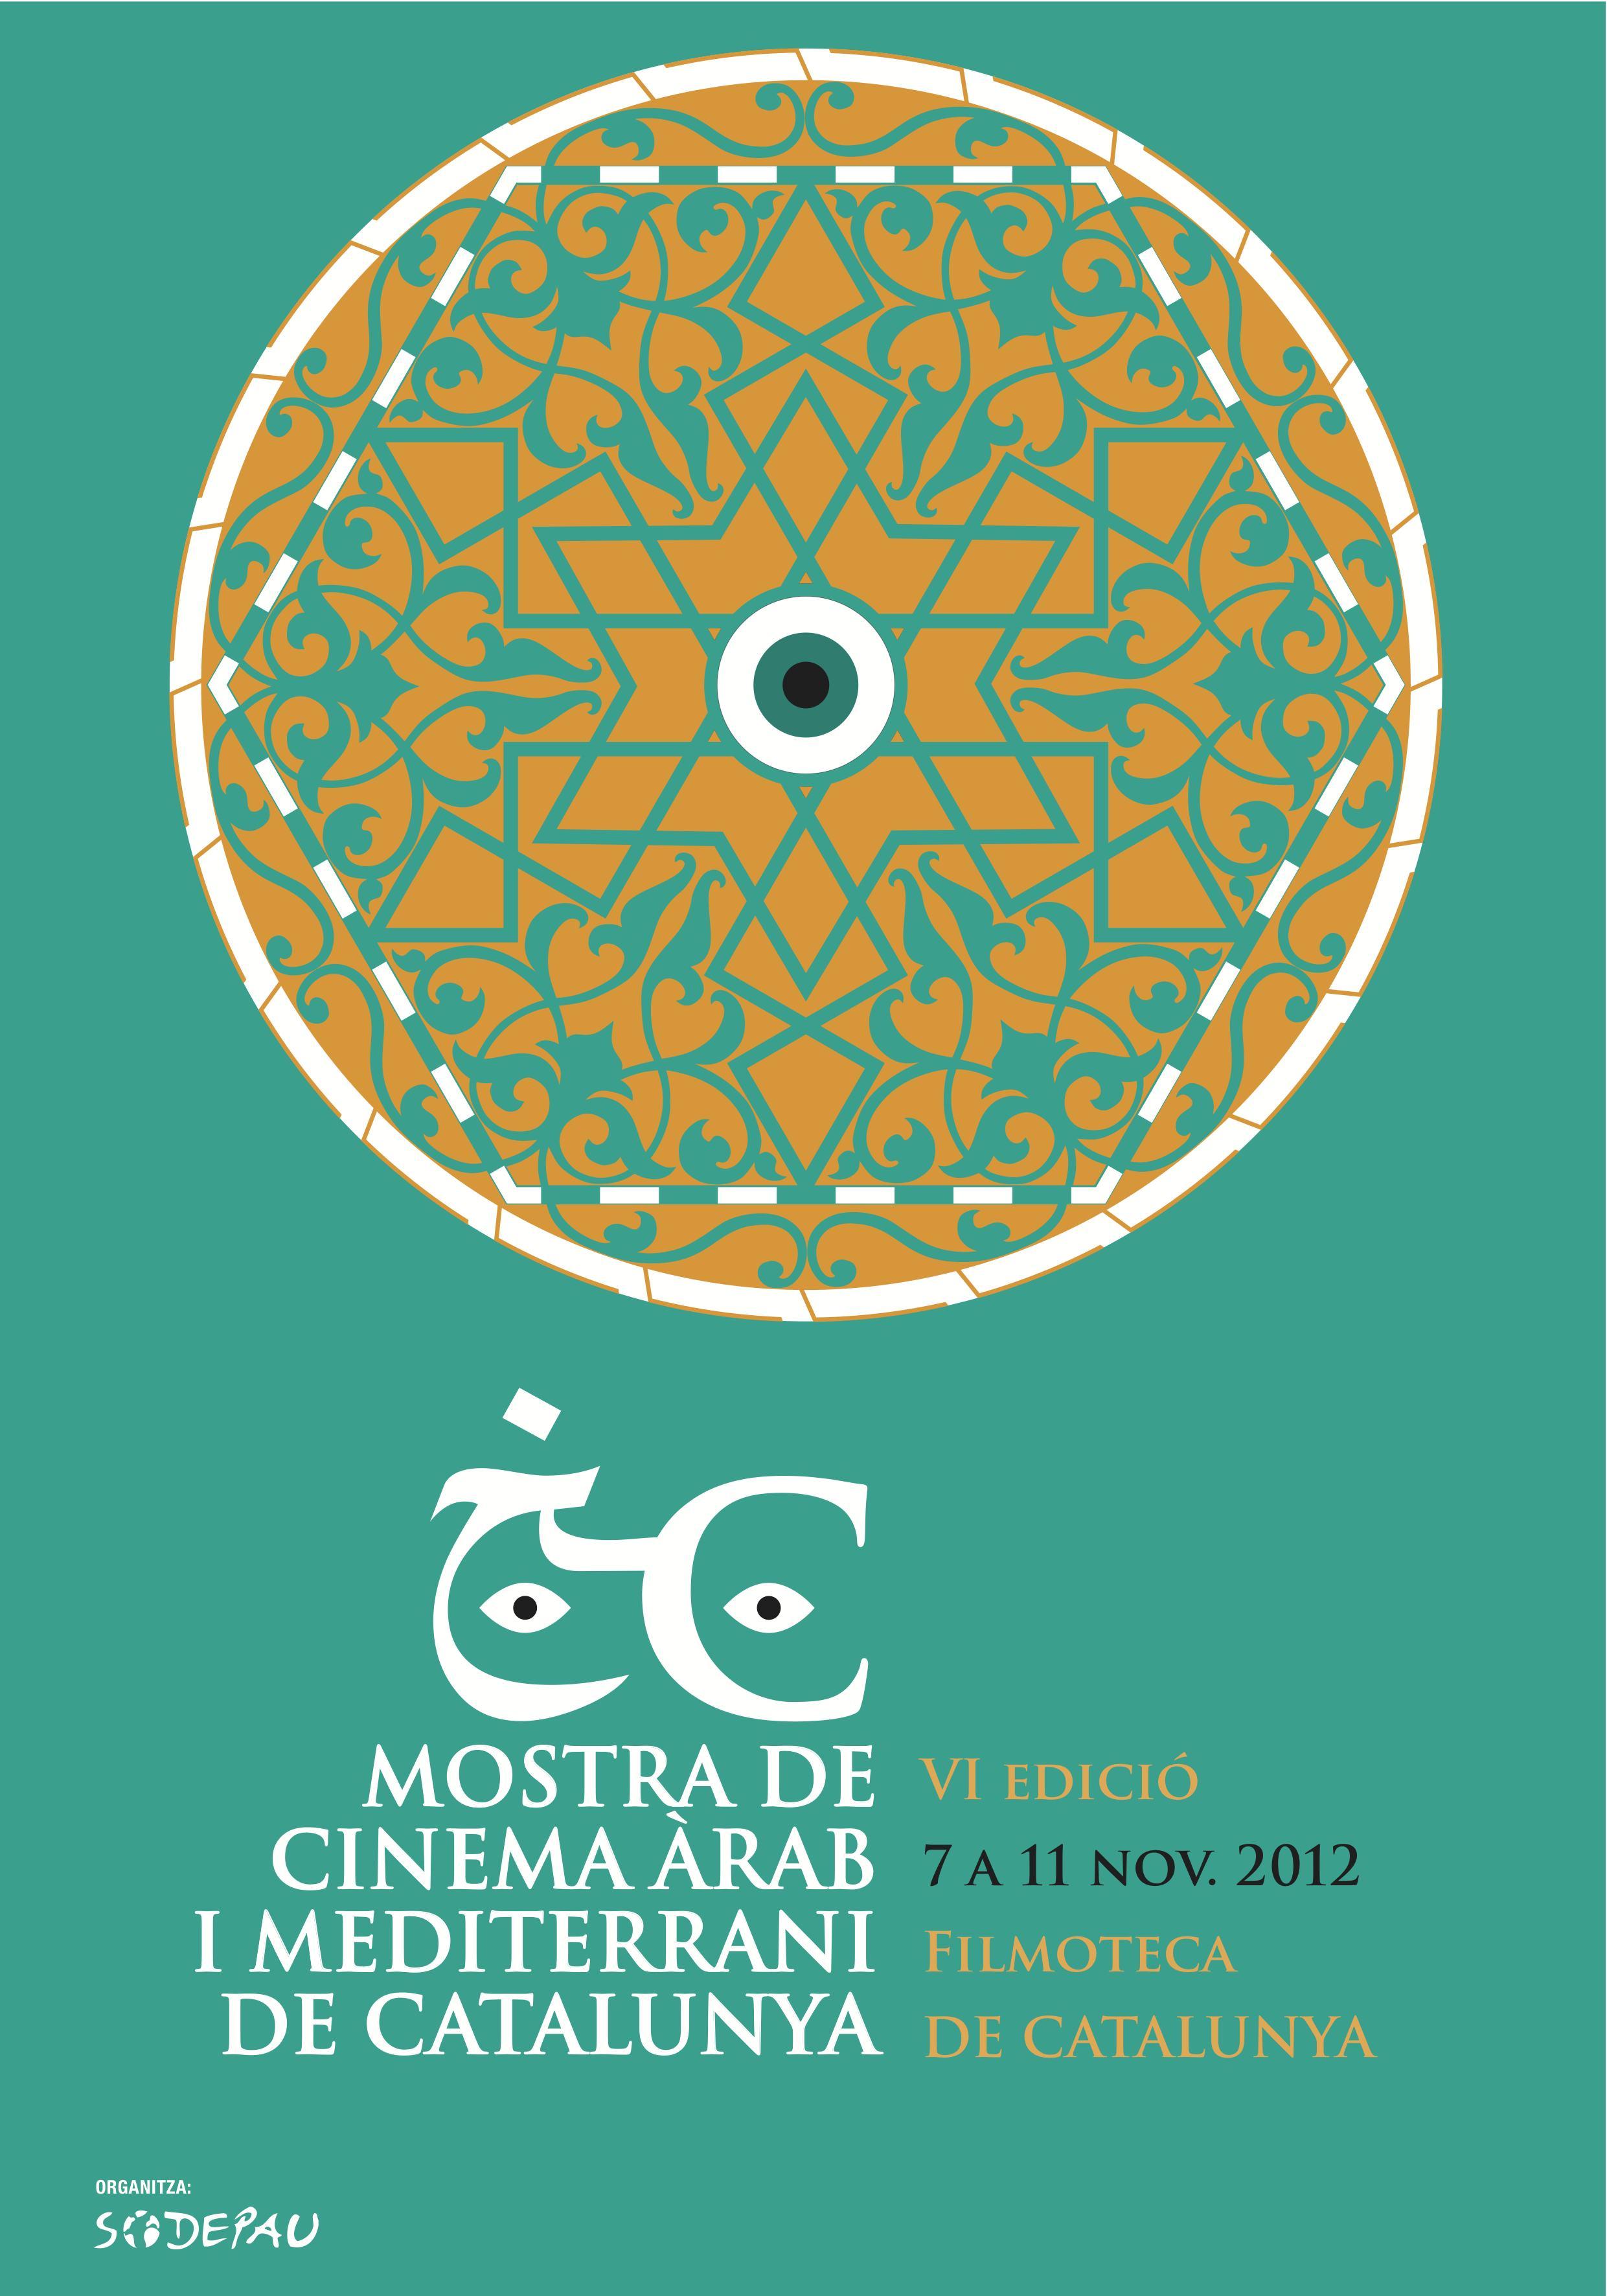 http://www.comedia.cat/proyectos/carteles/original/mostra_cine_arabe_cartell363-316.jpg